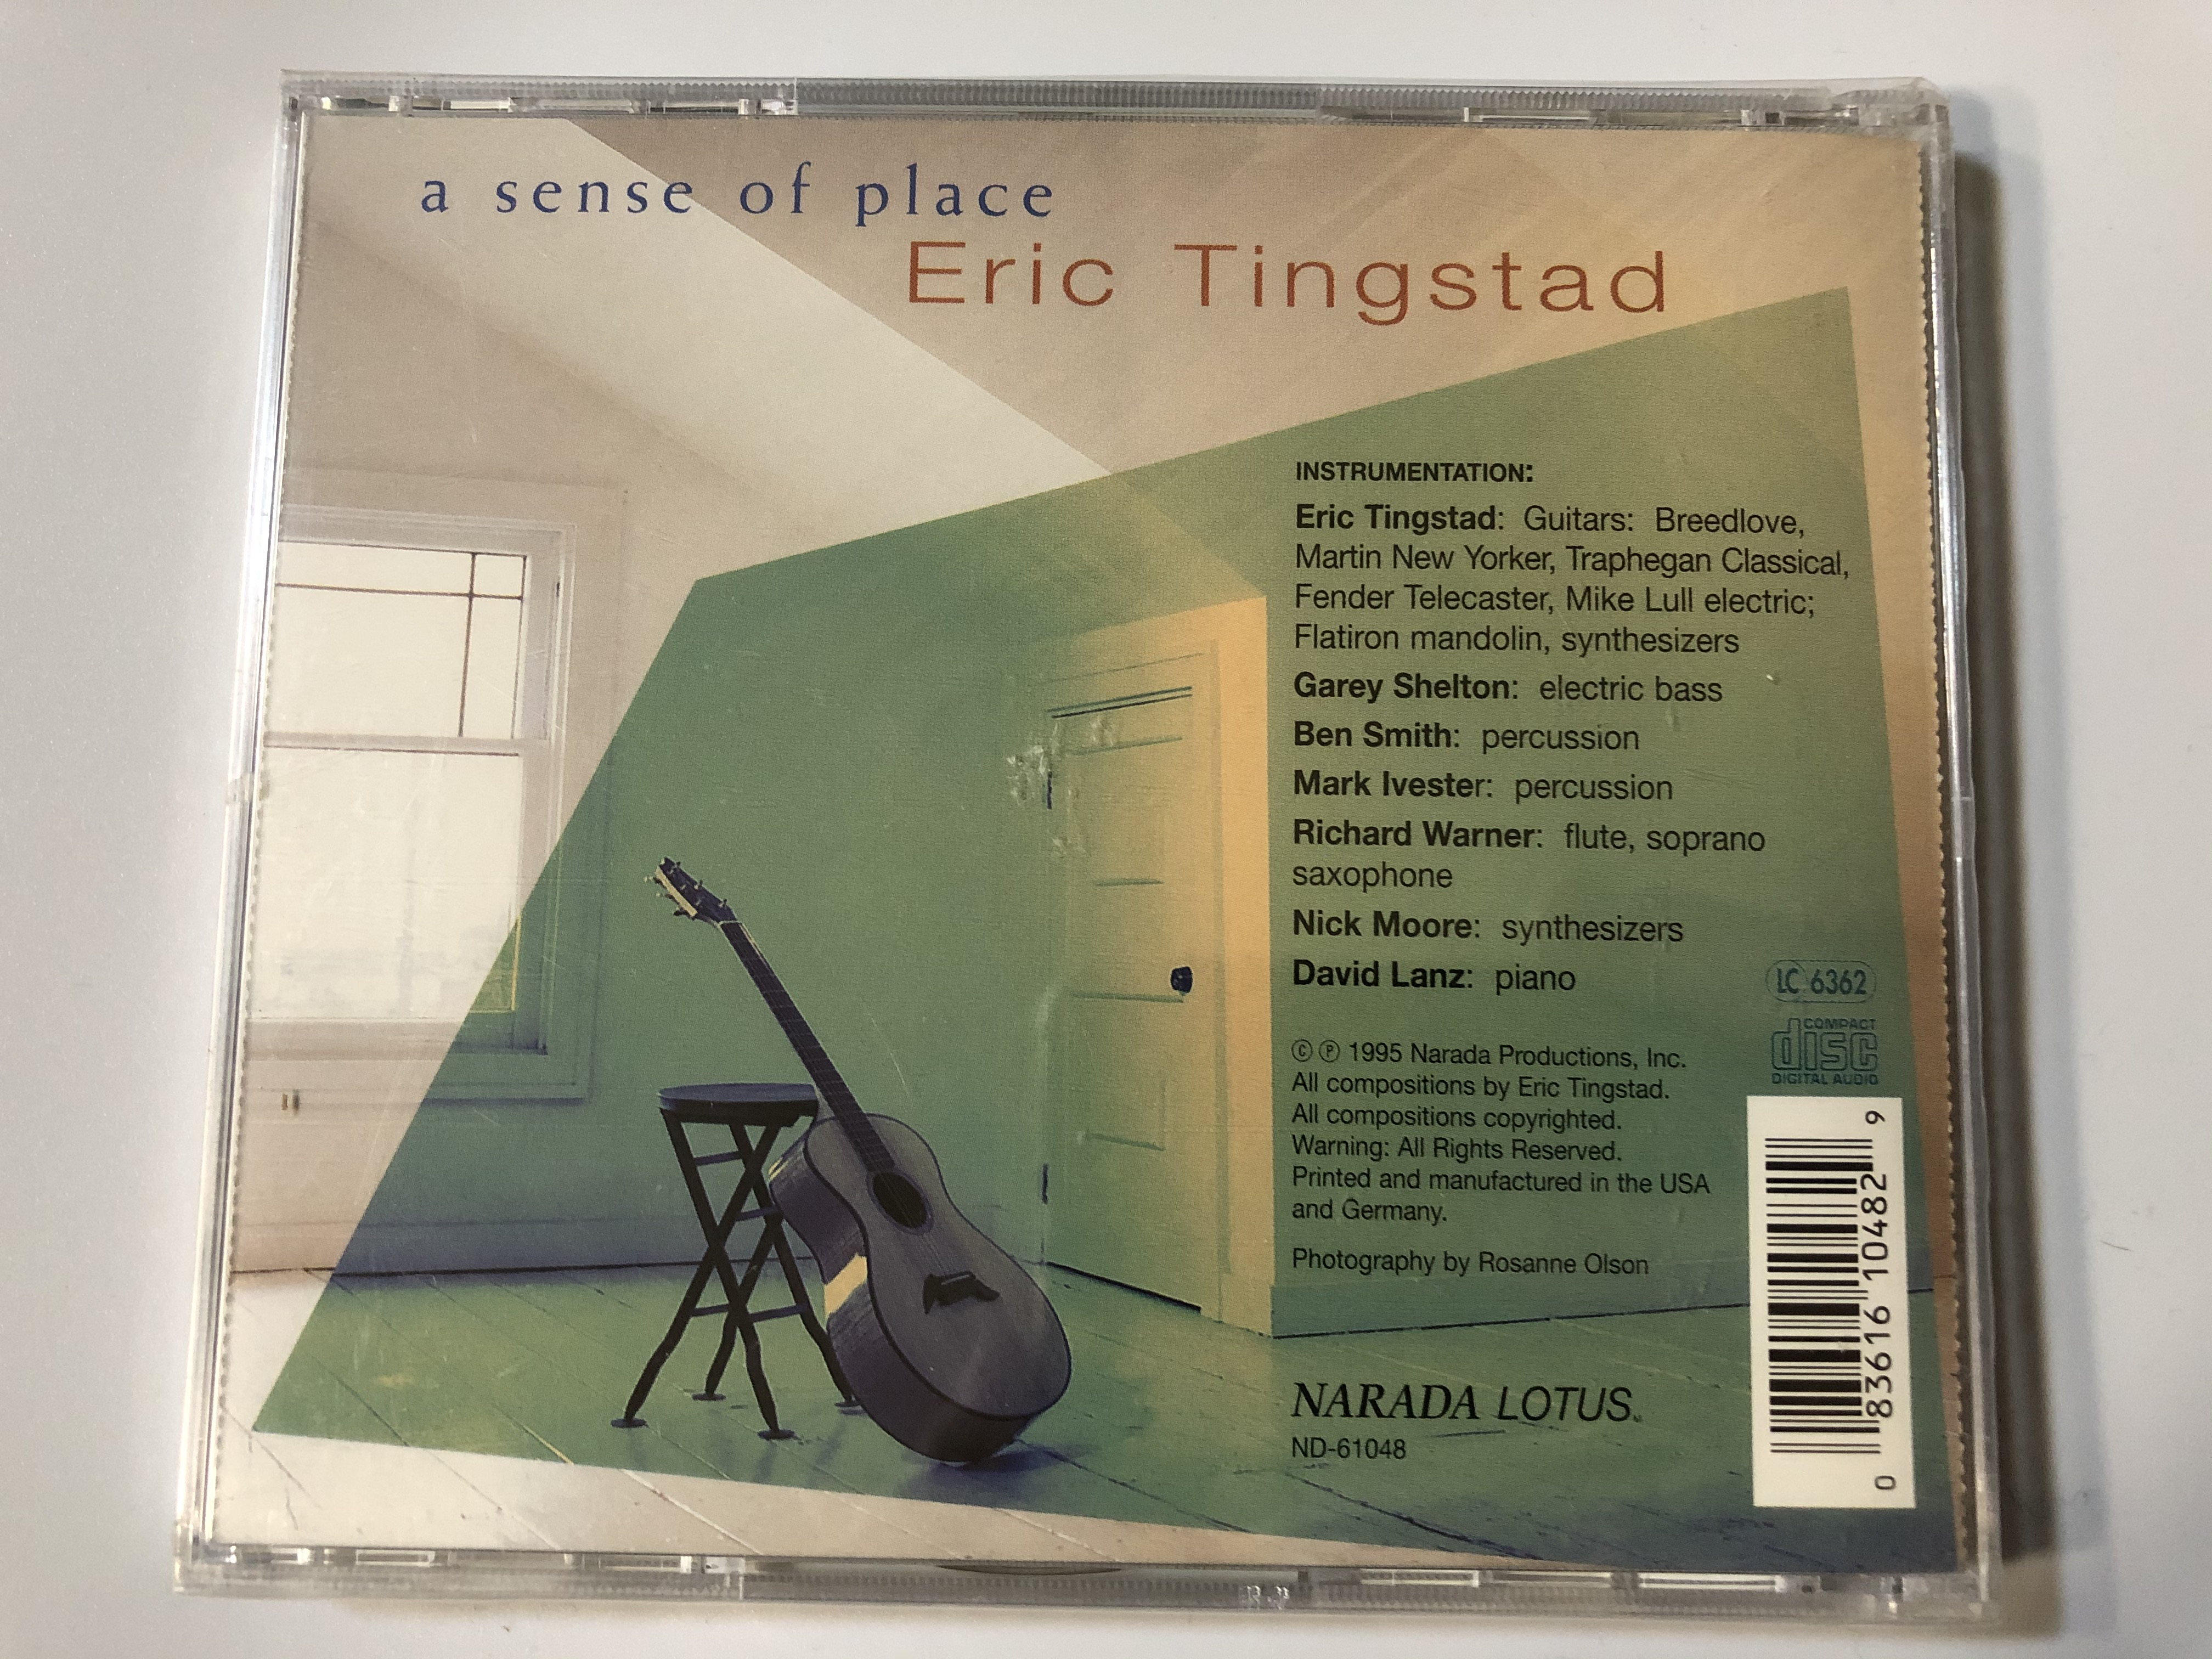 eric-tingstad-a-sense-of-place-narada-lotus-audio-cd-1995-nd-61048-2-.jpg